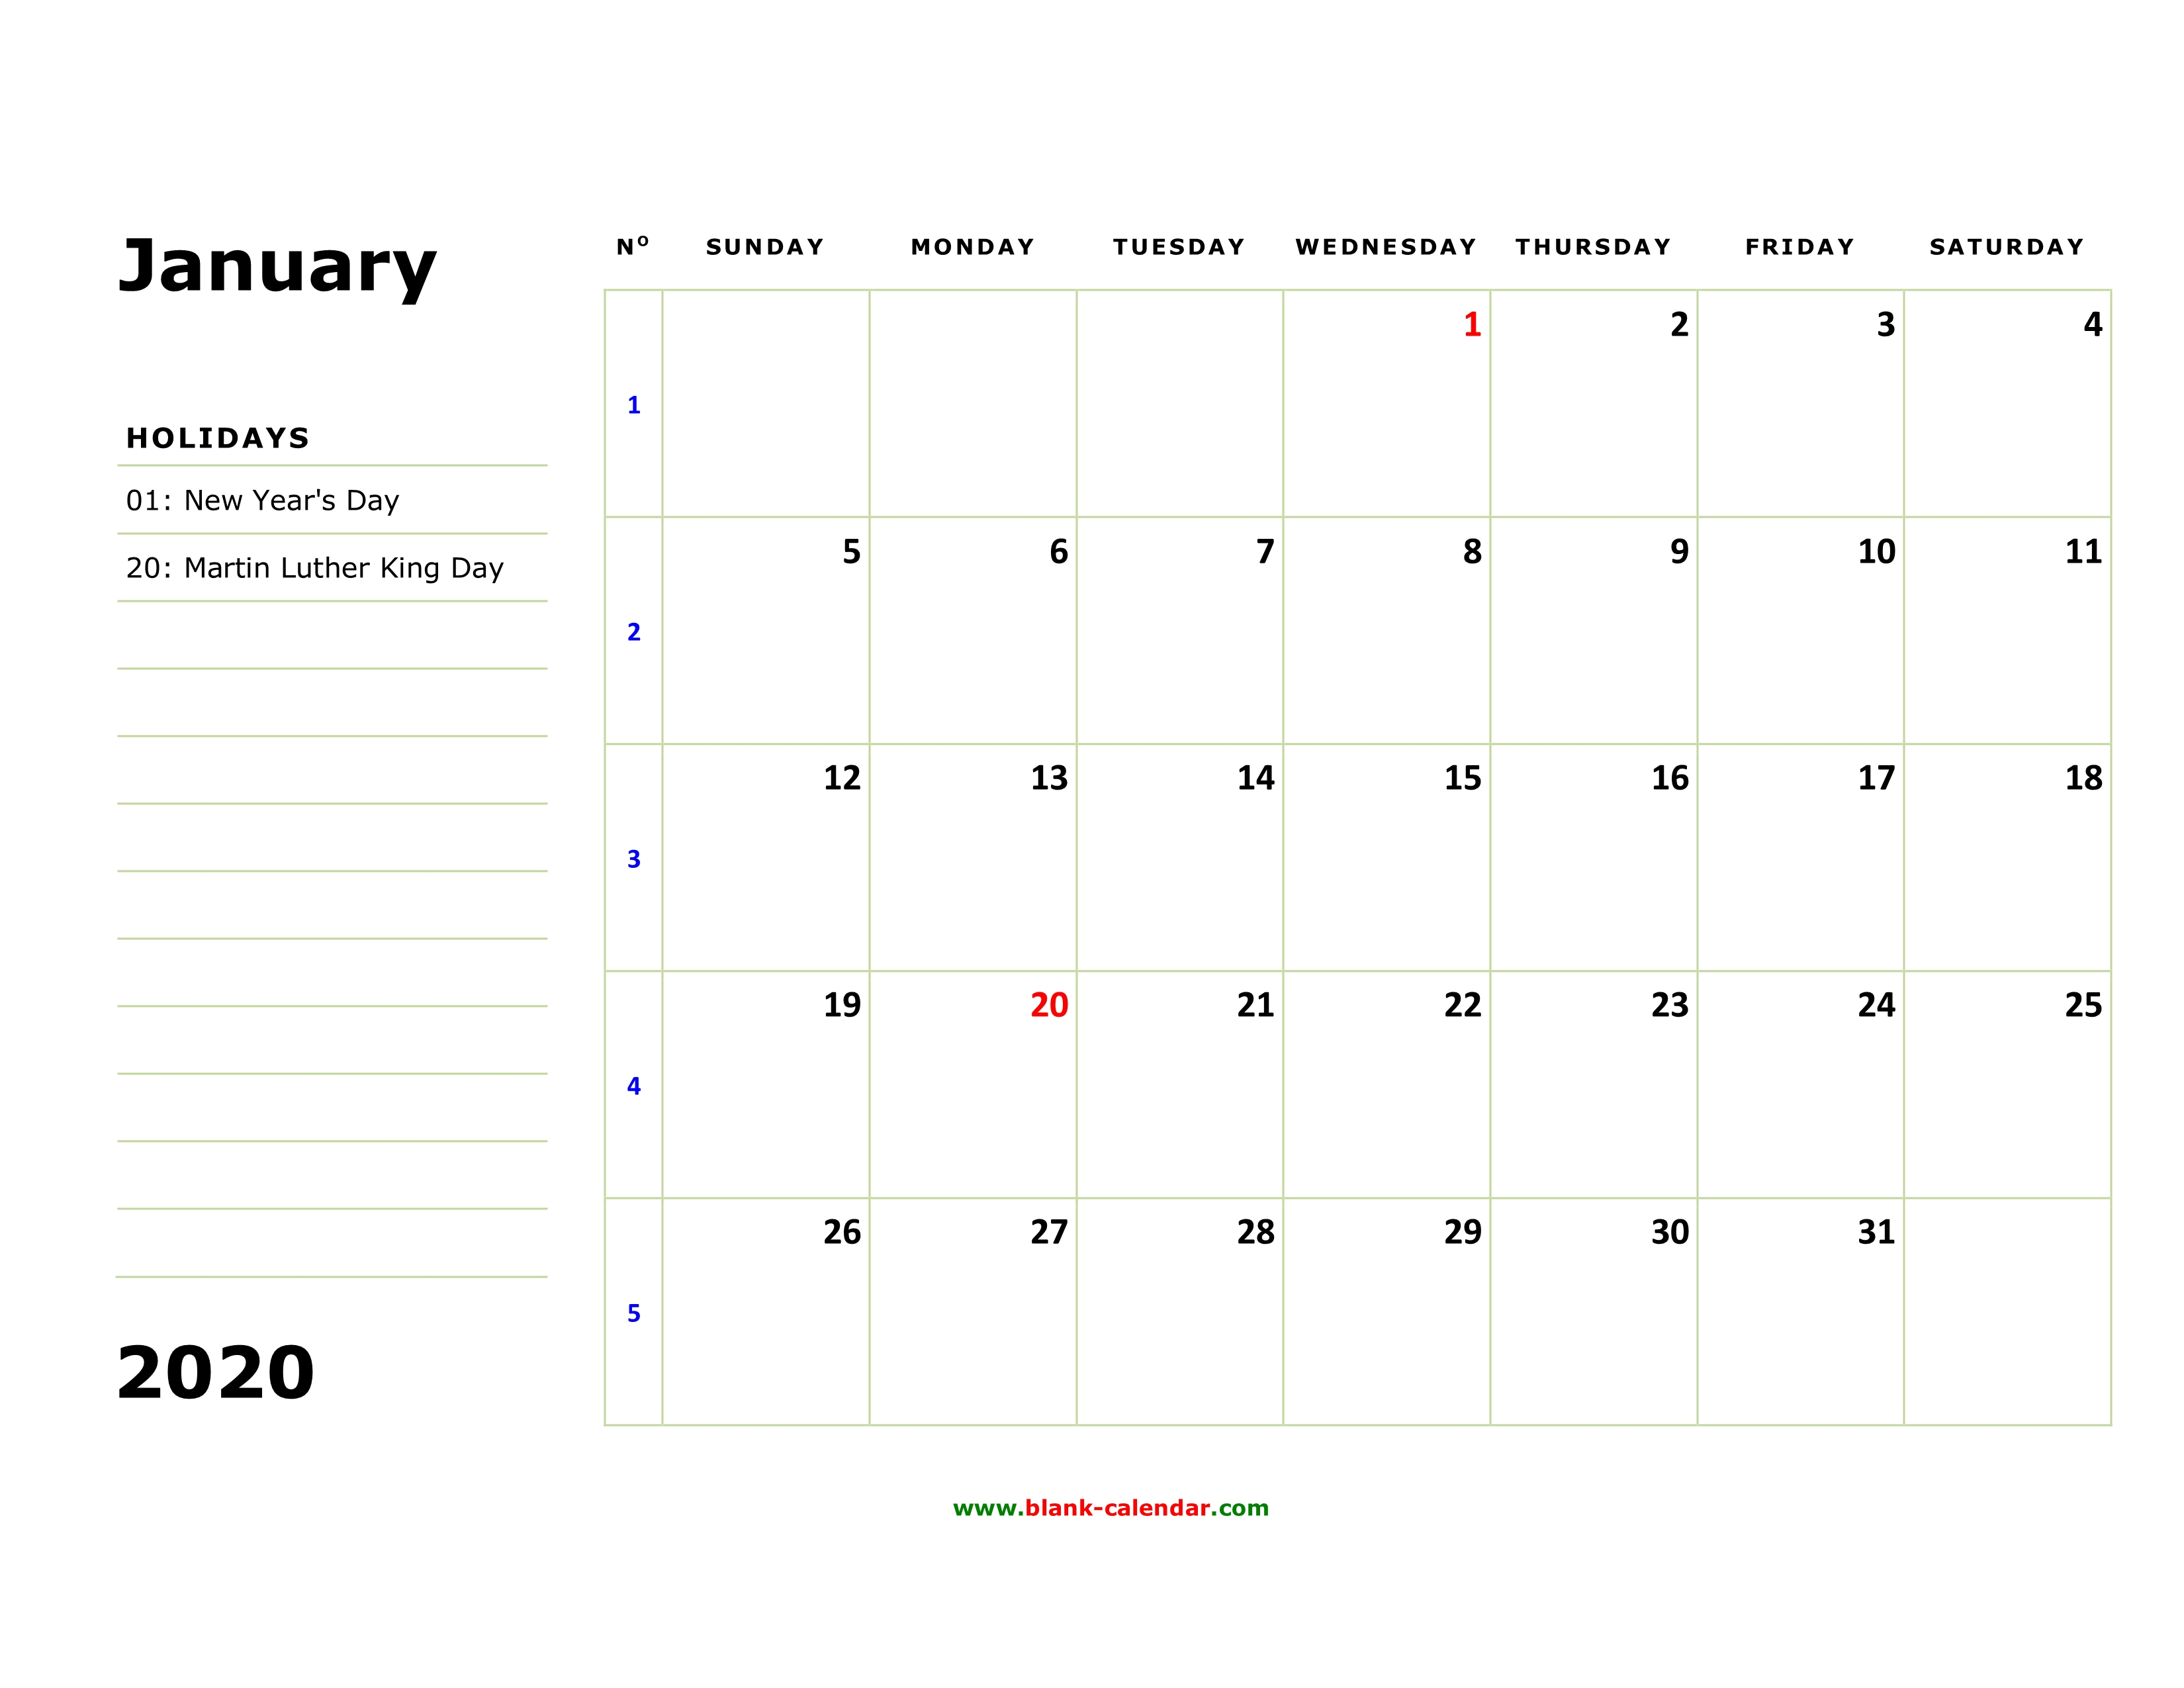 January 2020 Calendar With Holidays Jpg Free Download Printable January 2020 Calendar, large box, holidays